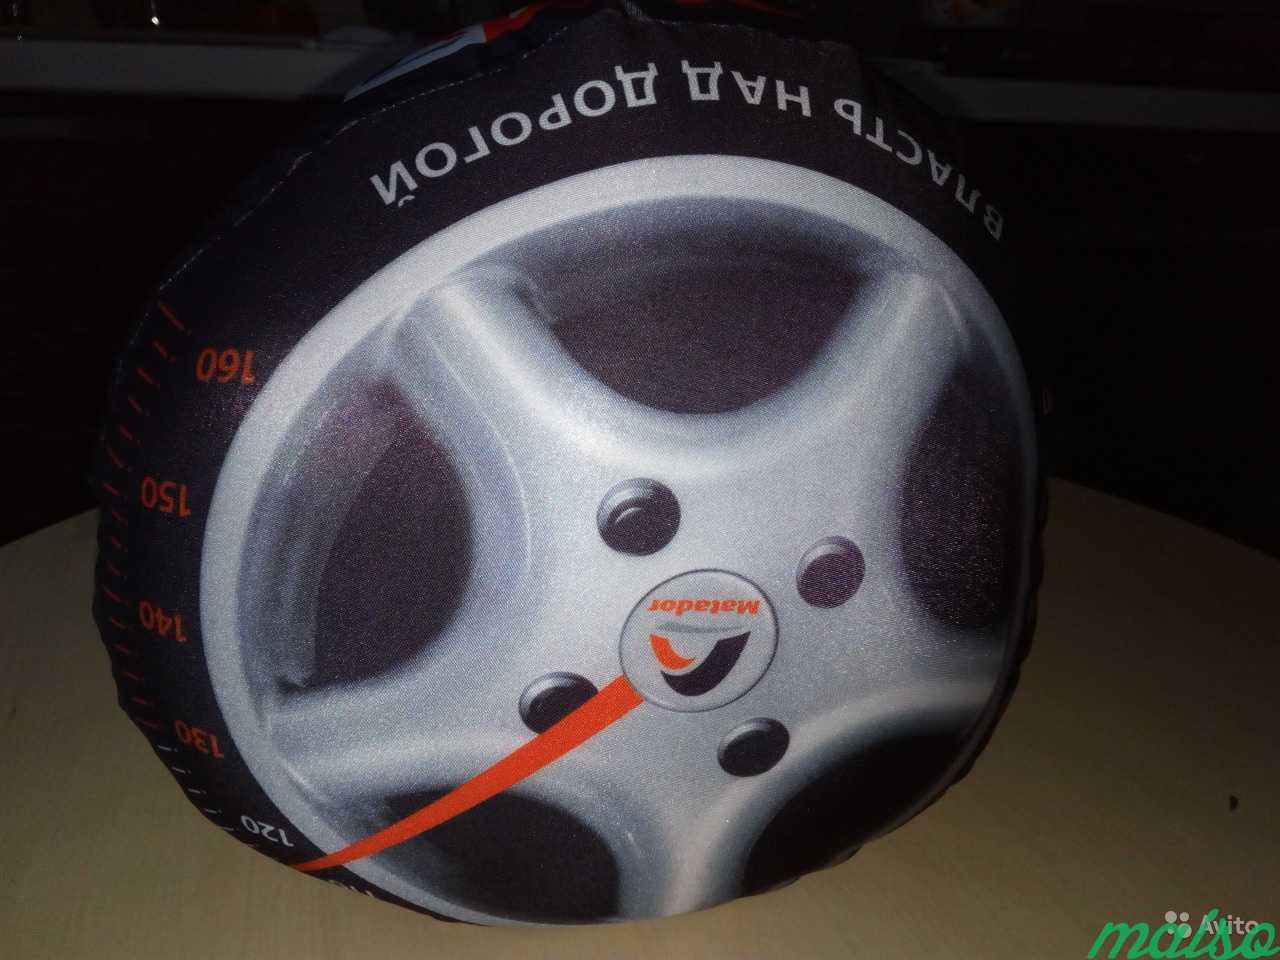 Подушка-антистресс колесо в Москве. Фото 3